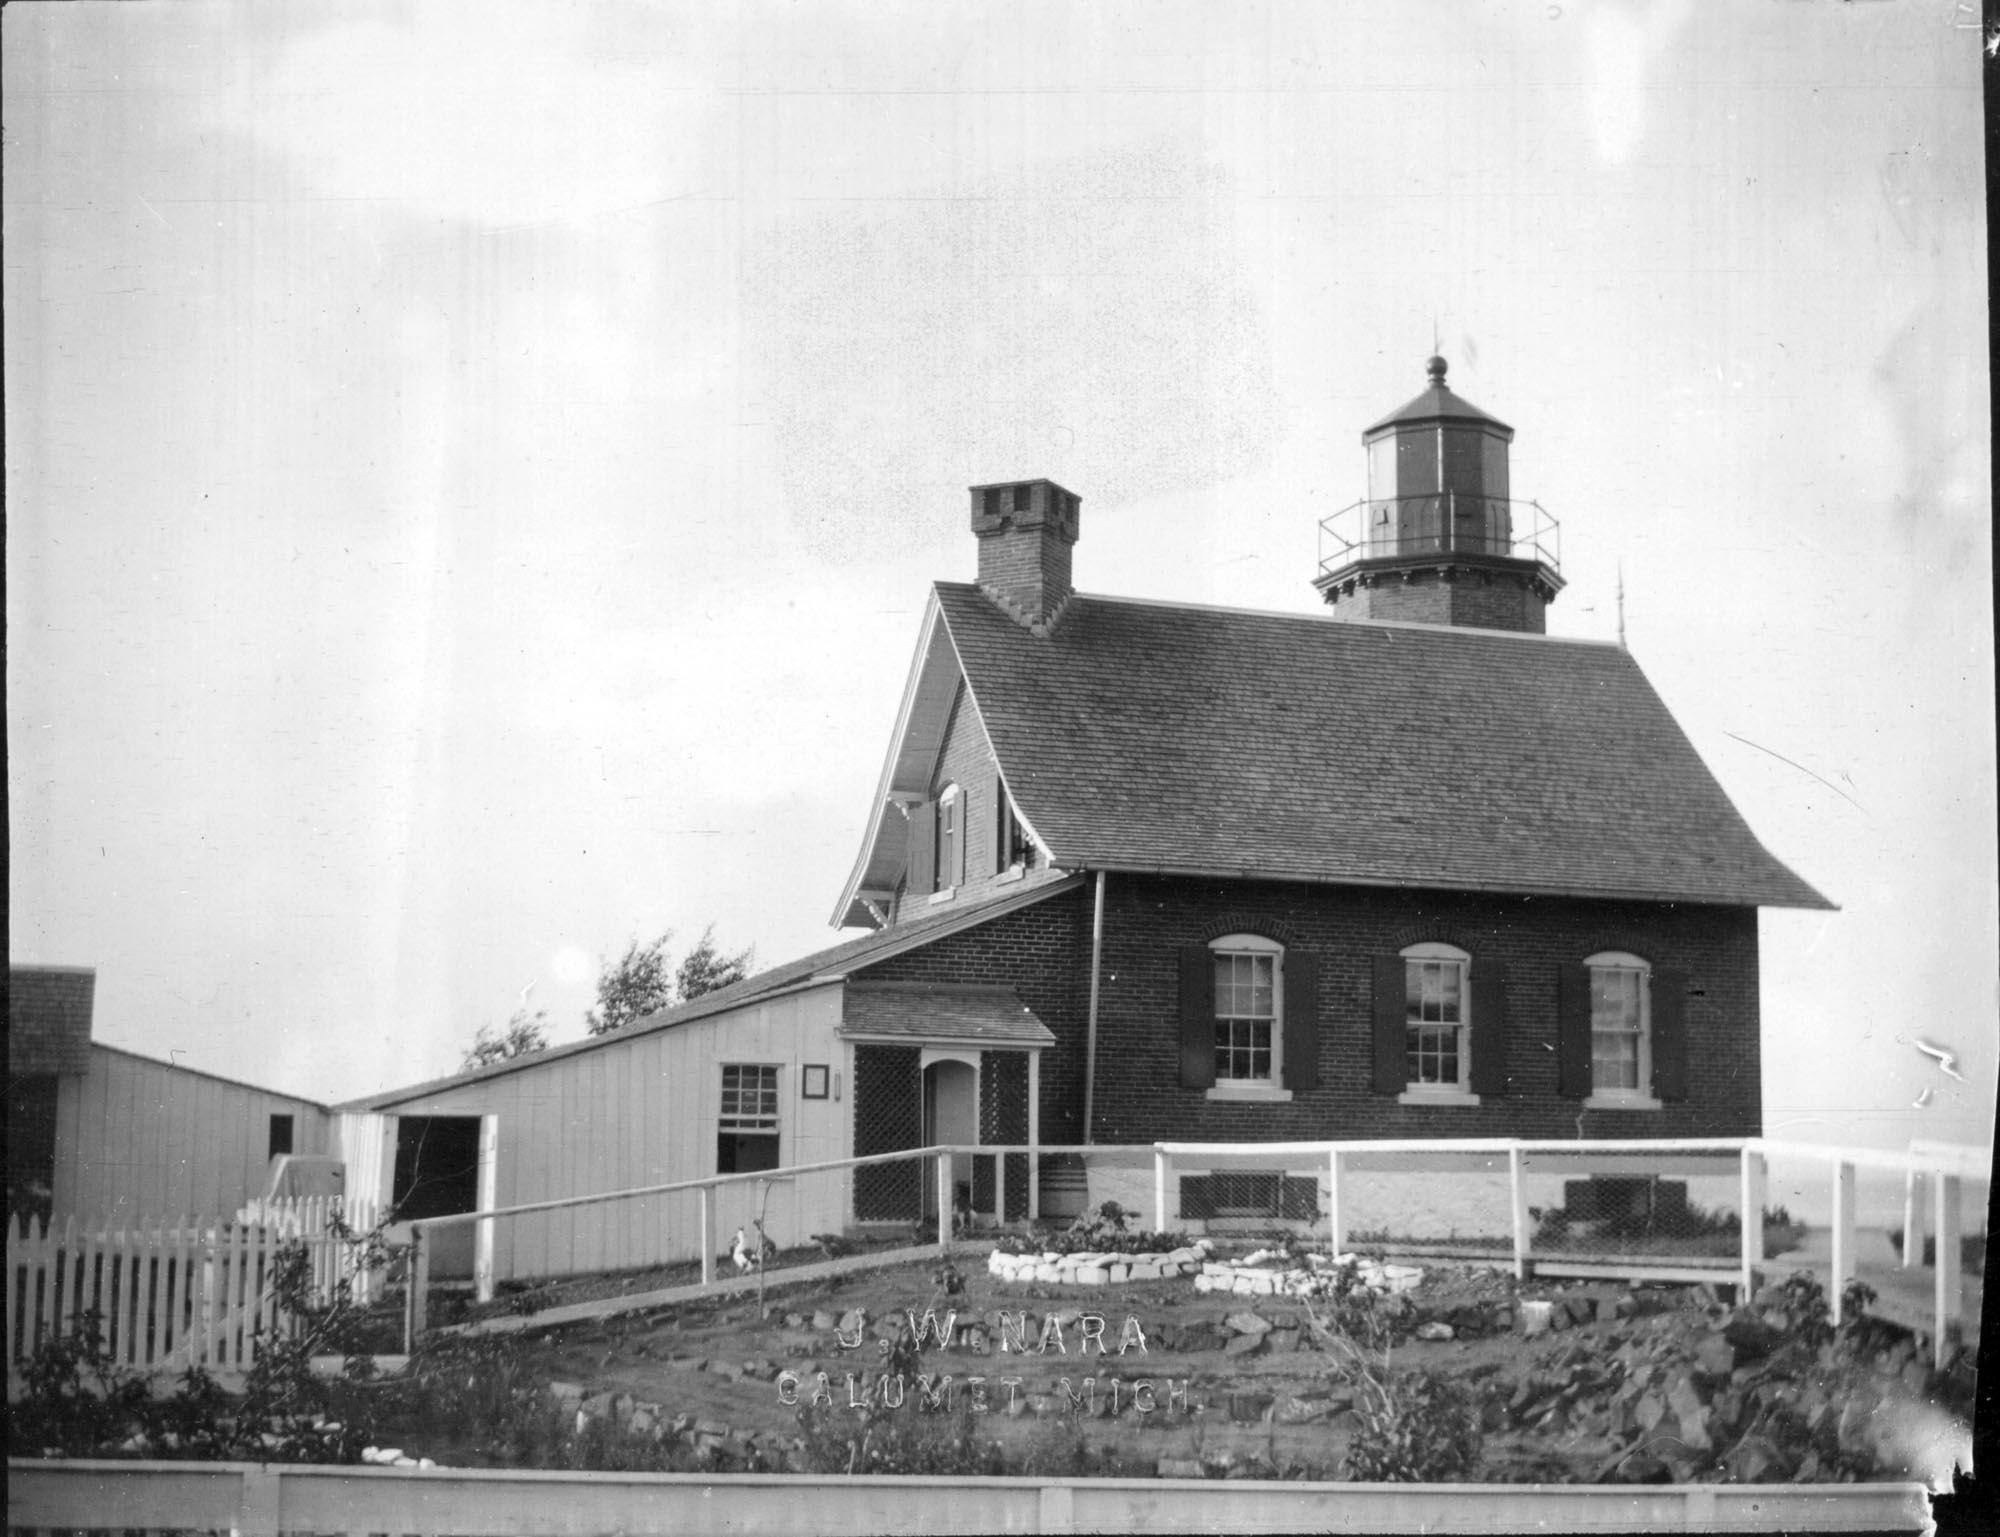 Eagle Harbor Lighthouse. Photograph by J.W. Nara, Image # Nara 42-220.